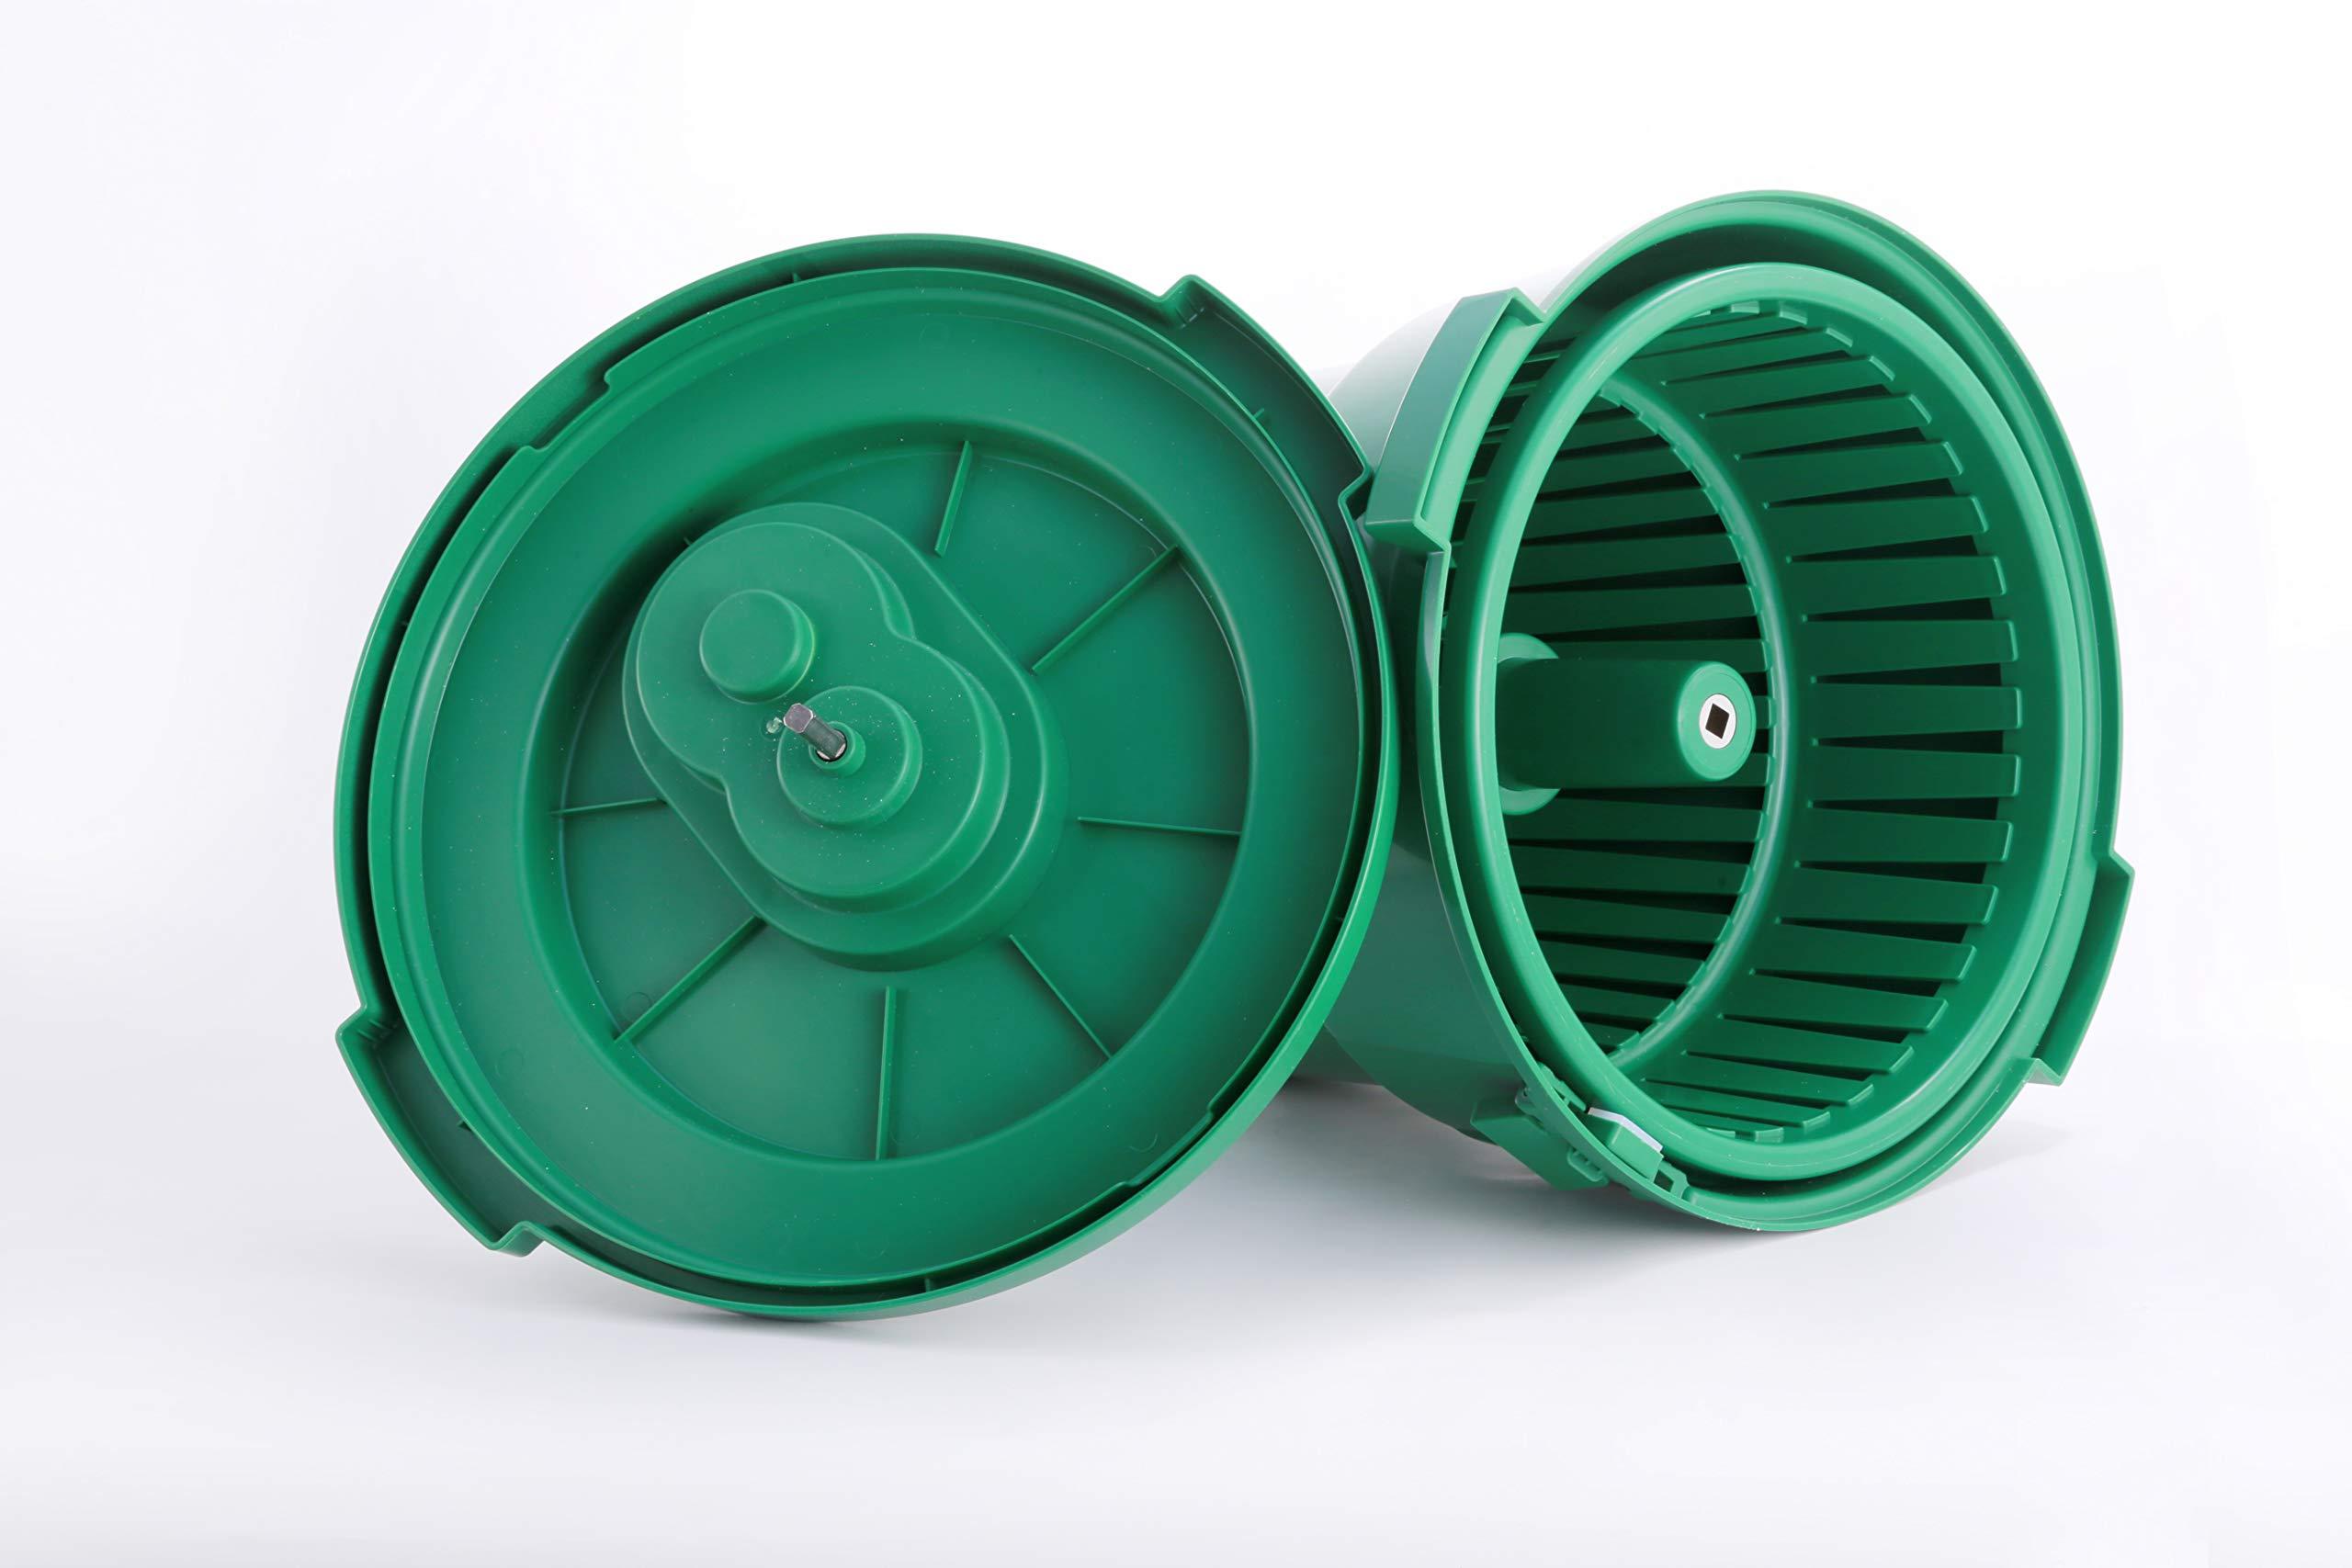 Hakka 20 Liter/5 Gallon Large Commercial Manual Salad Spinner&Dryer by HAKKA FOOD PROCESSING (Image #2)